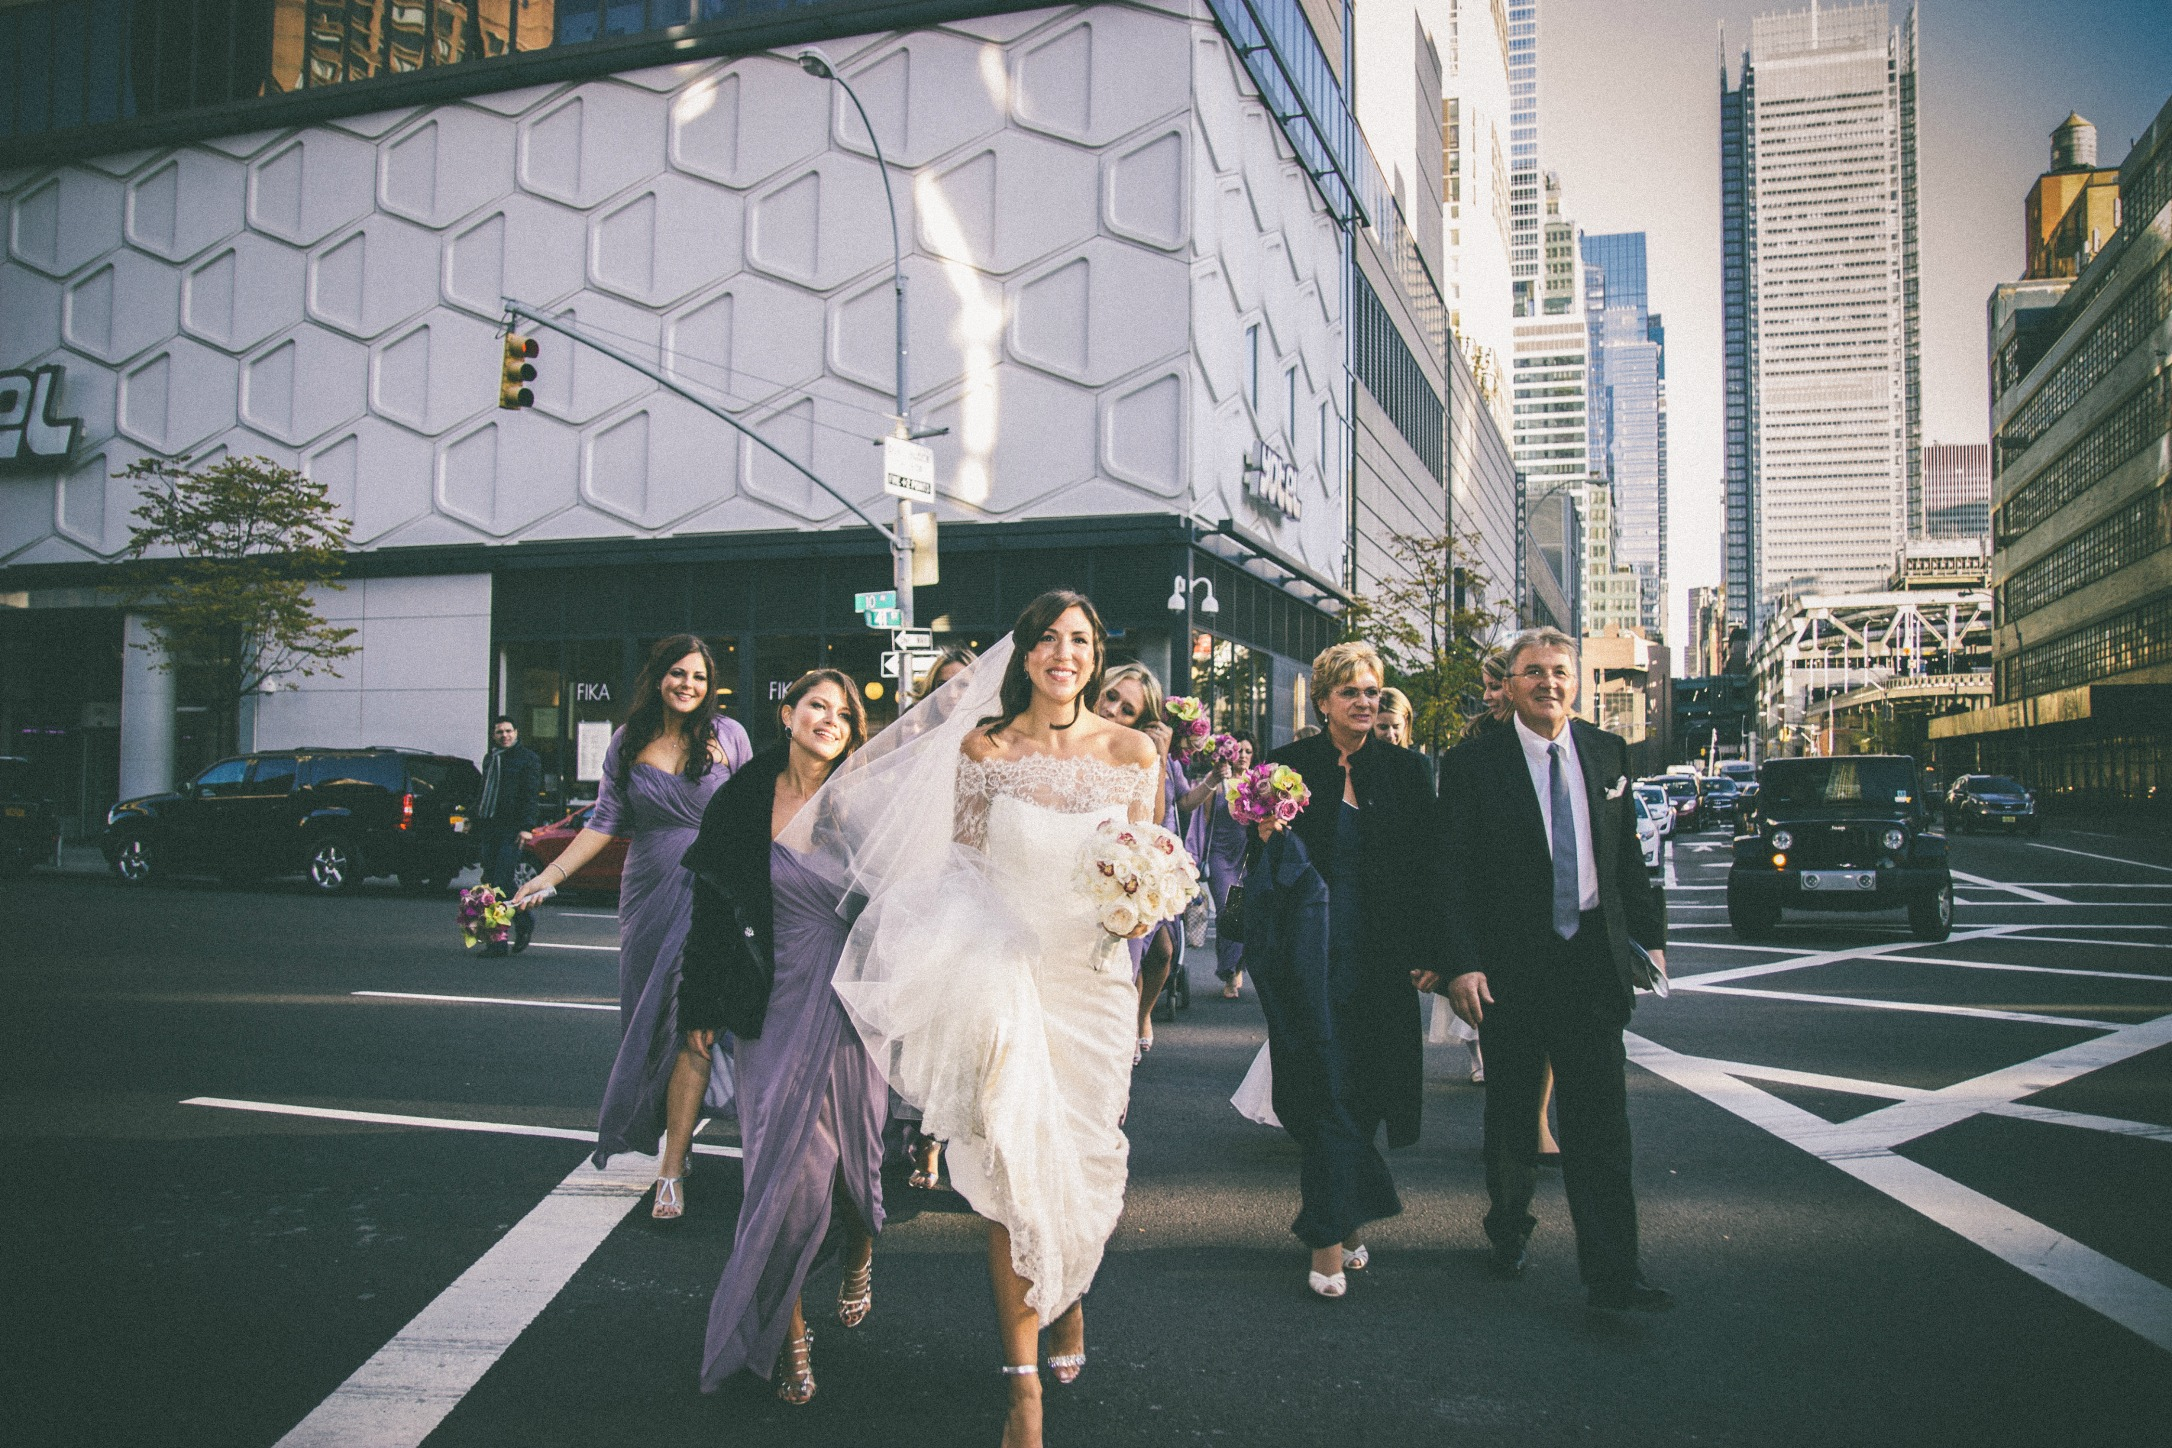 NYC Chic Winter Wedding ǀ Dee Kay Events ǀ Wedding Consultant ǀ Wedding Design I Bridal Party